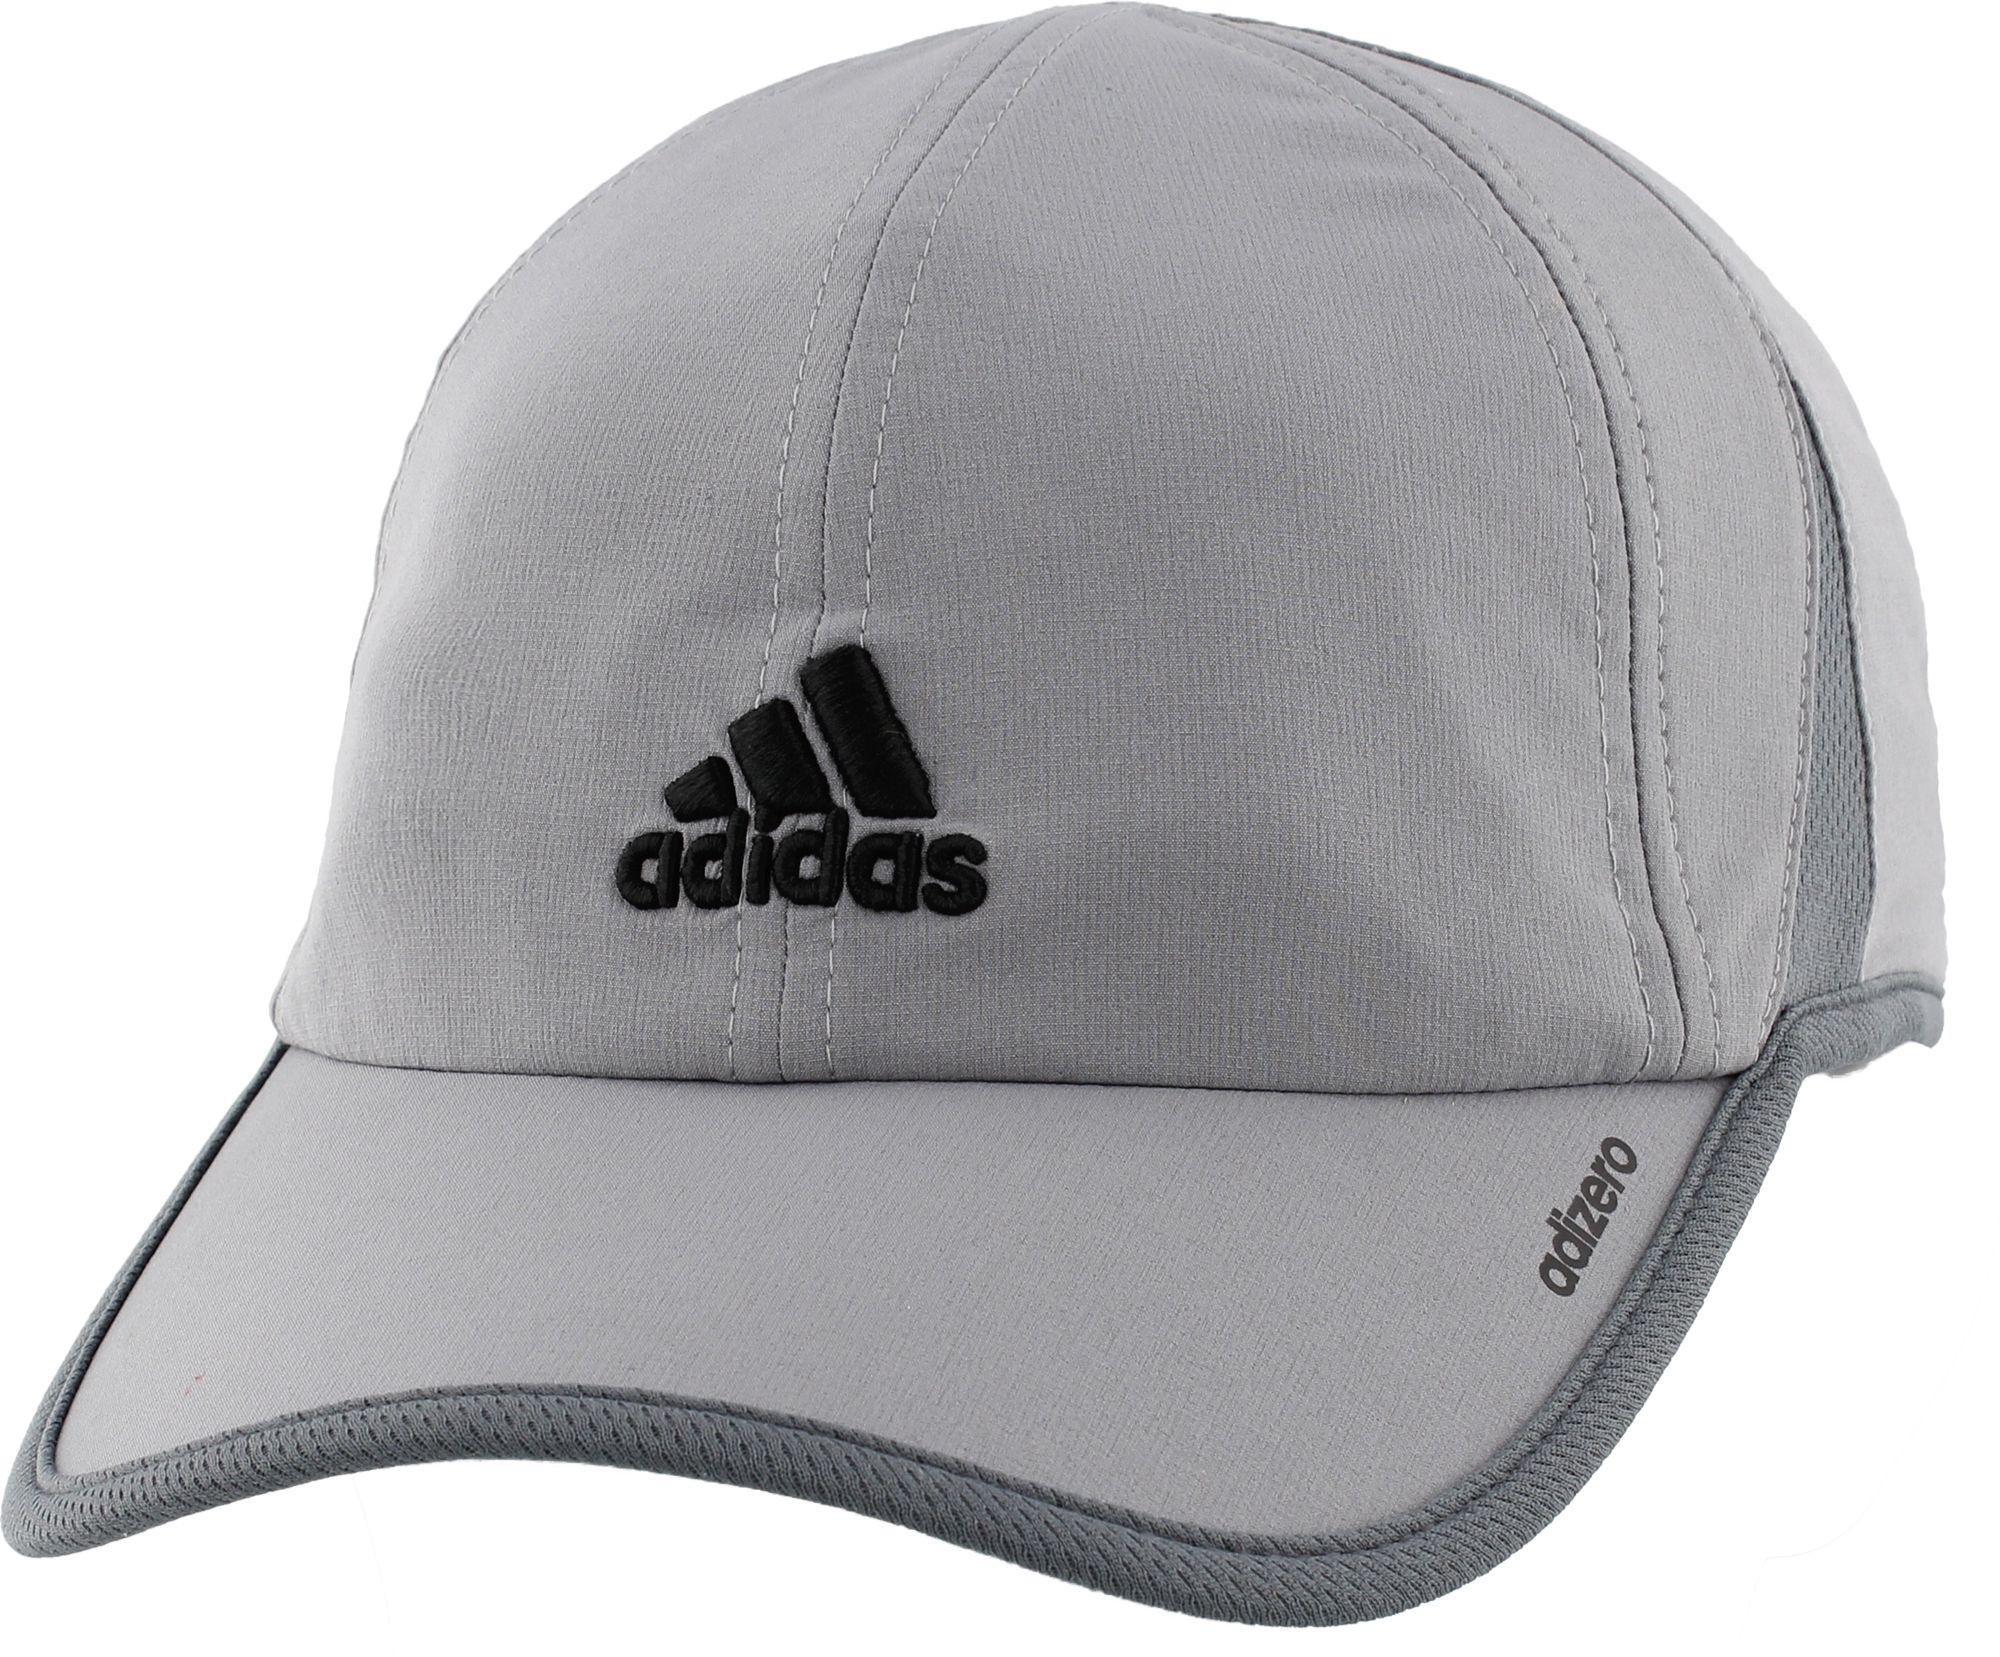 c0ae67287b9 View fullscreen · Adidas - Gray Adizero Adjustable Cap for Men - Lyst